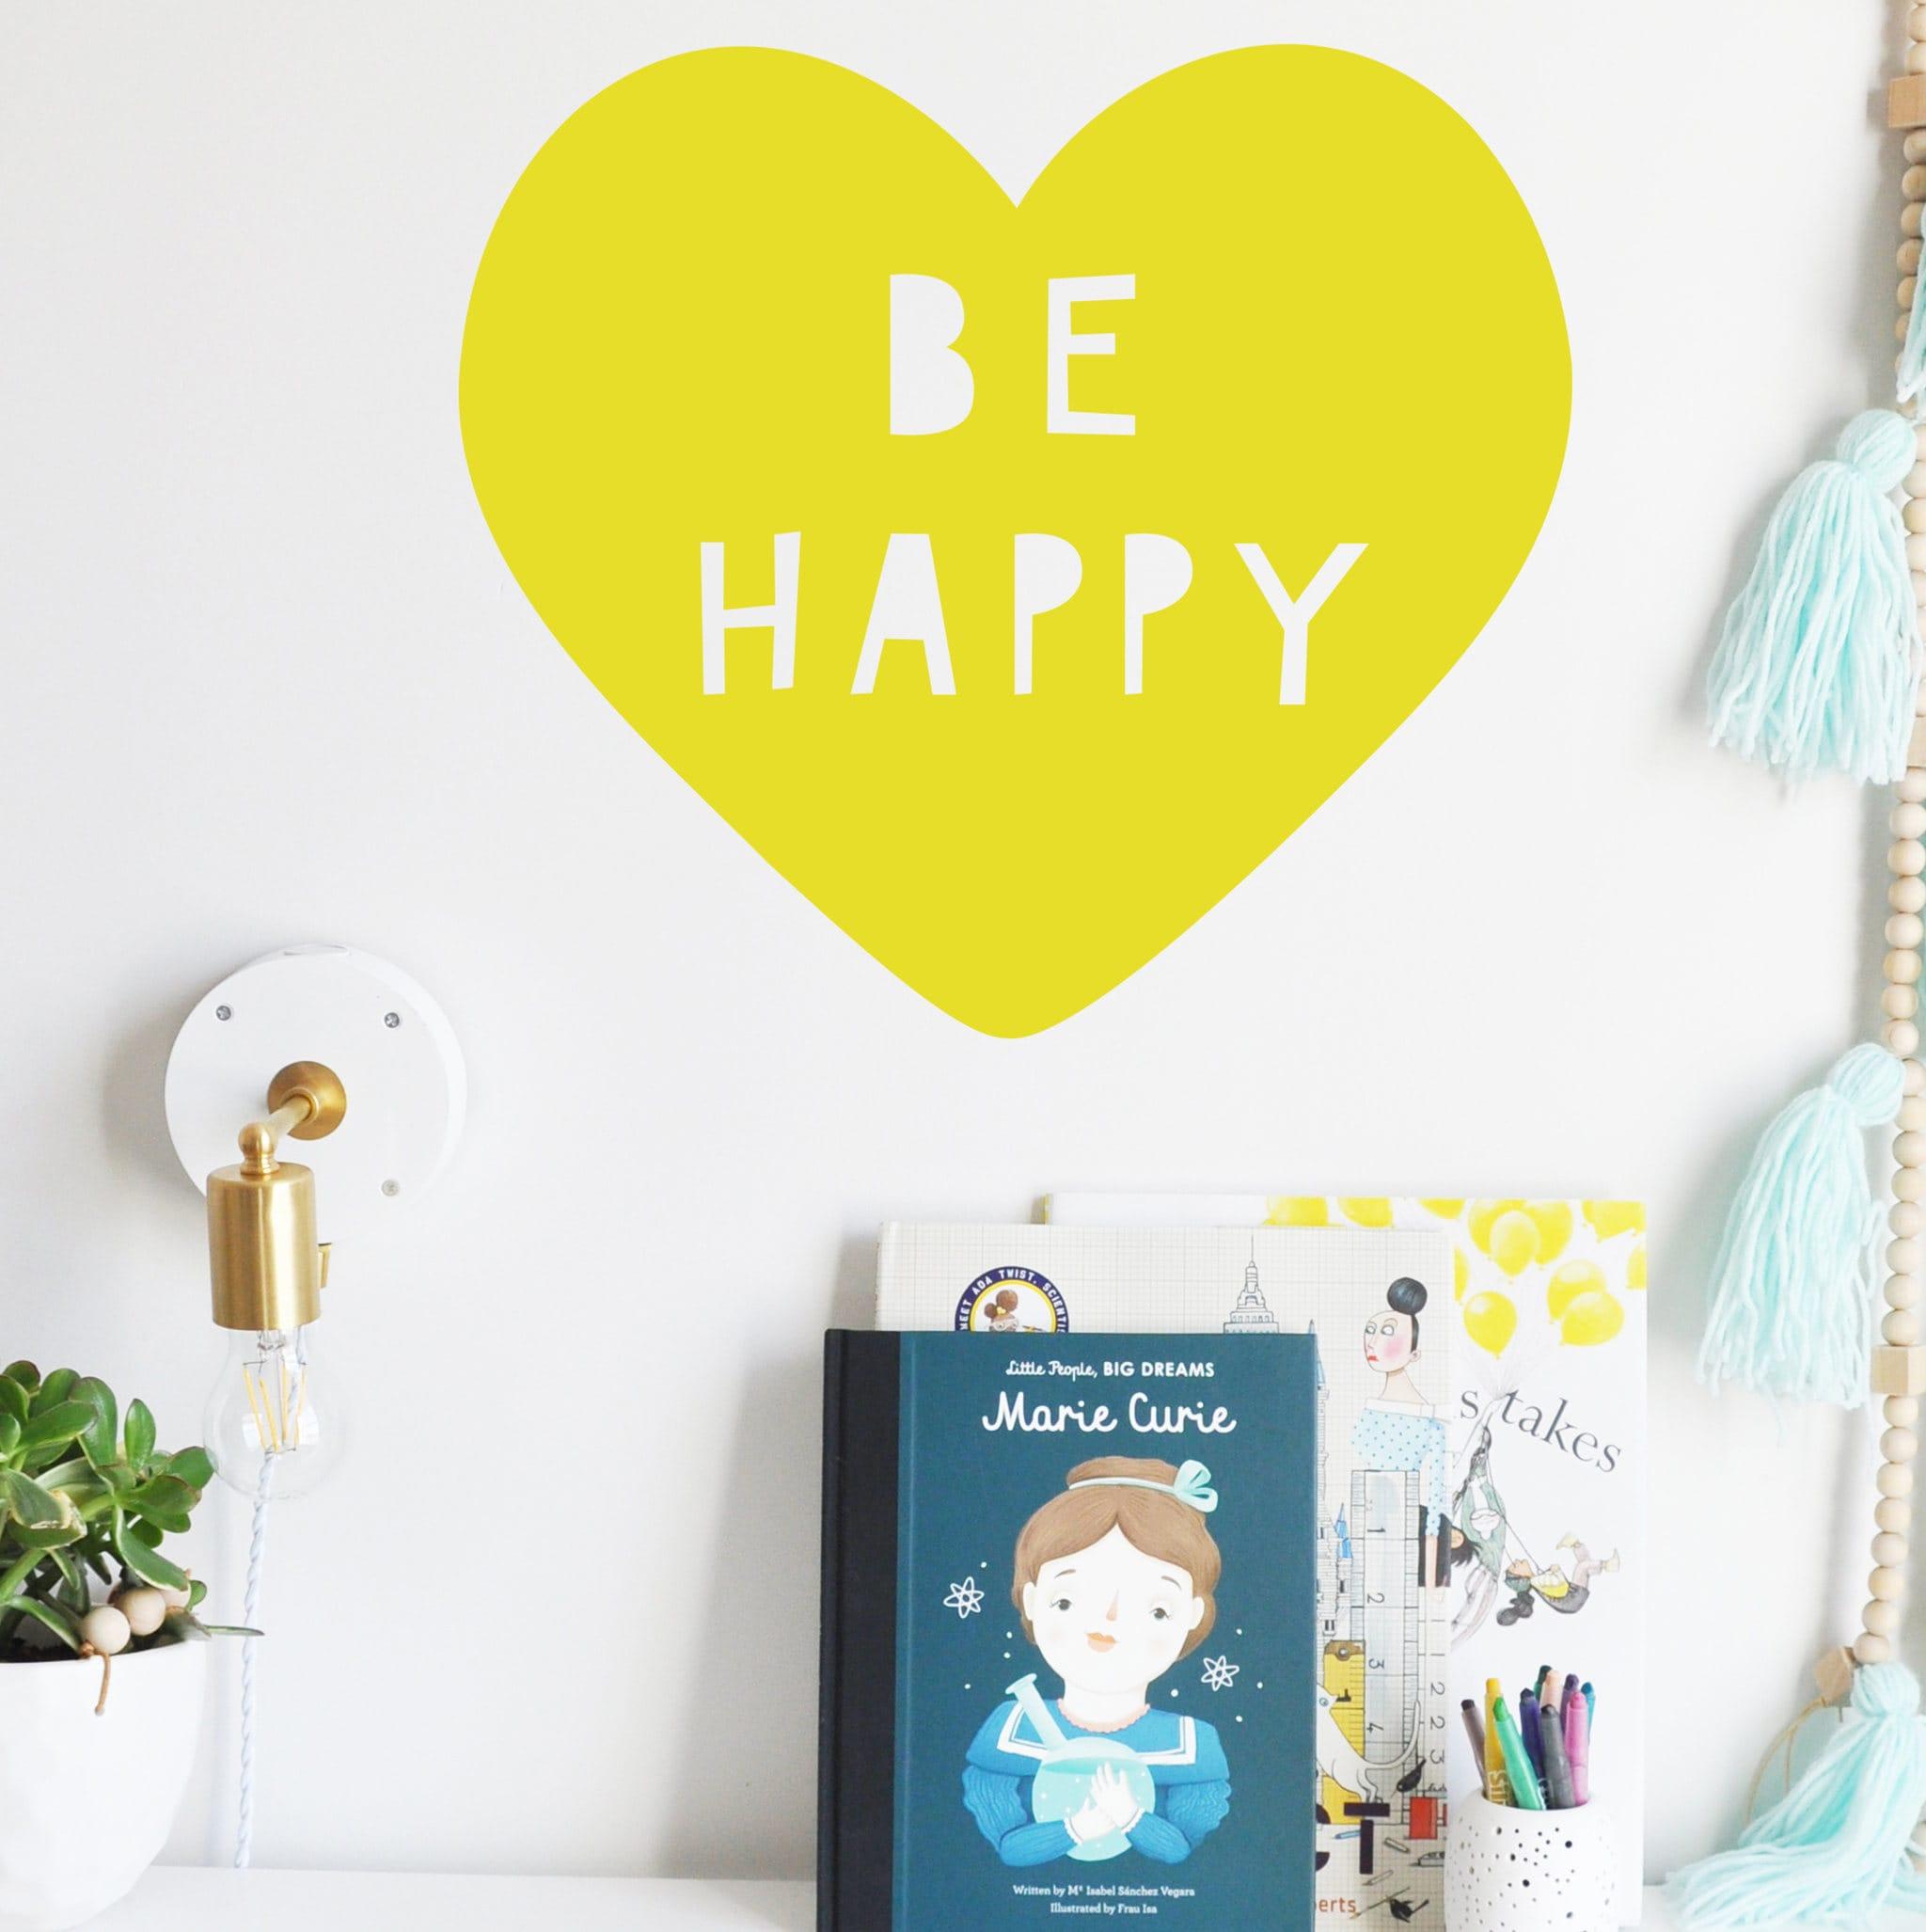 Wall Decal Be Happy Heart Wall Sticker Room Decor | Etsy